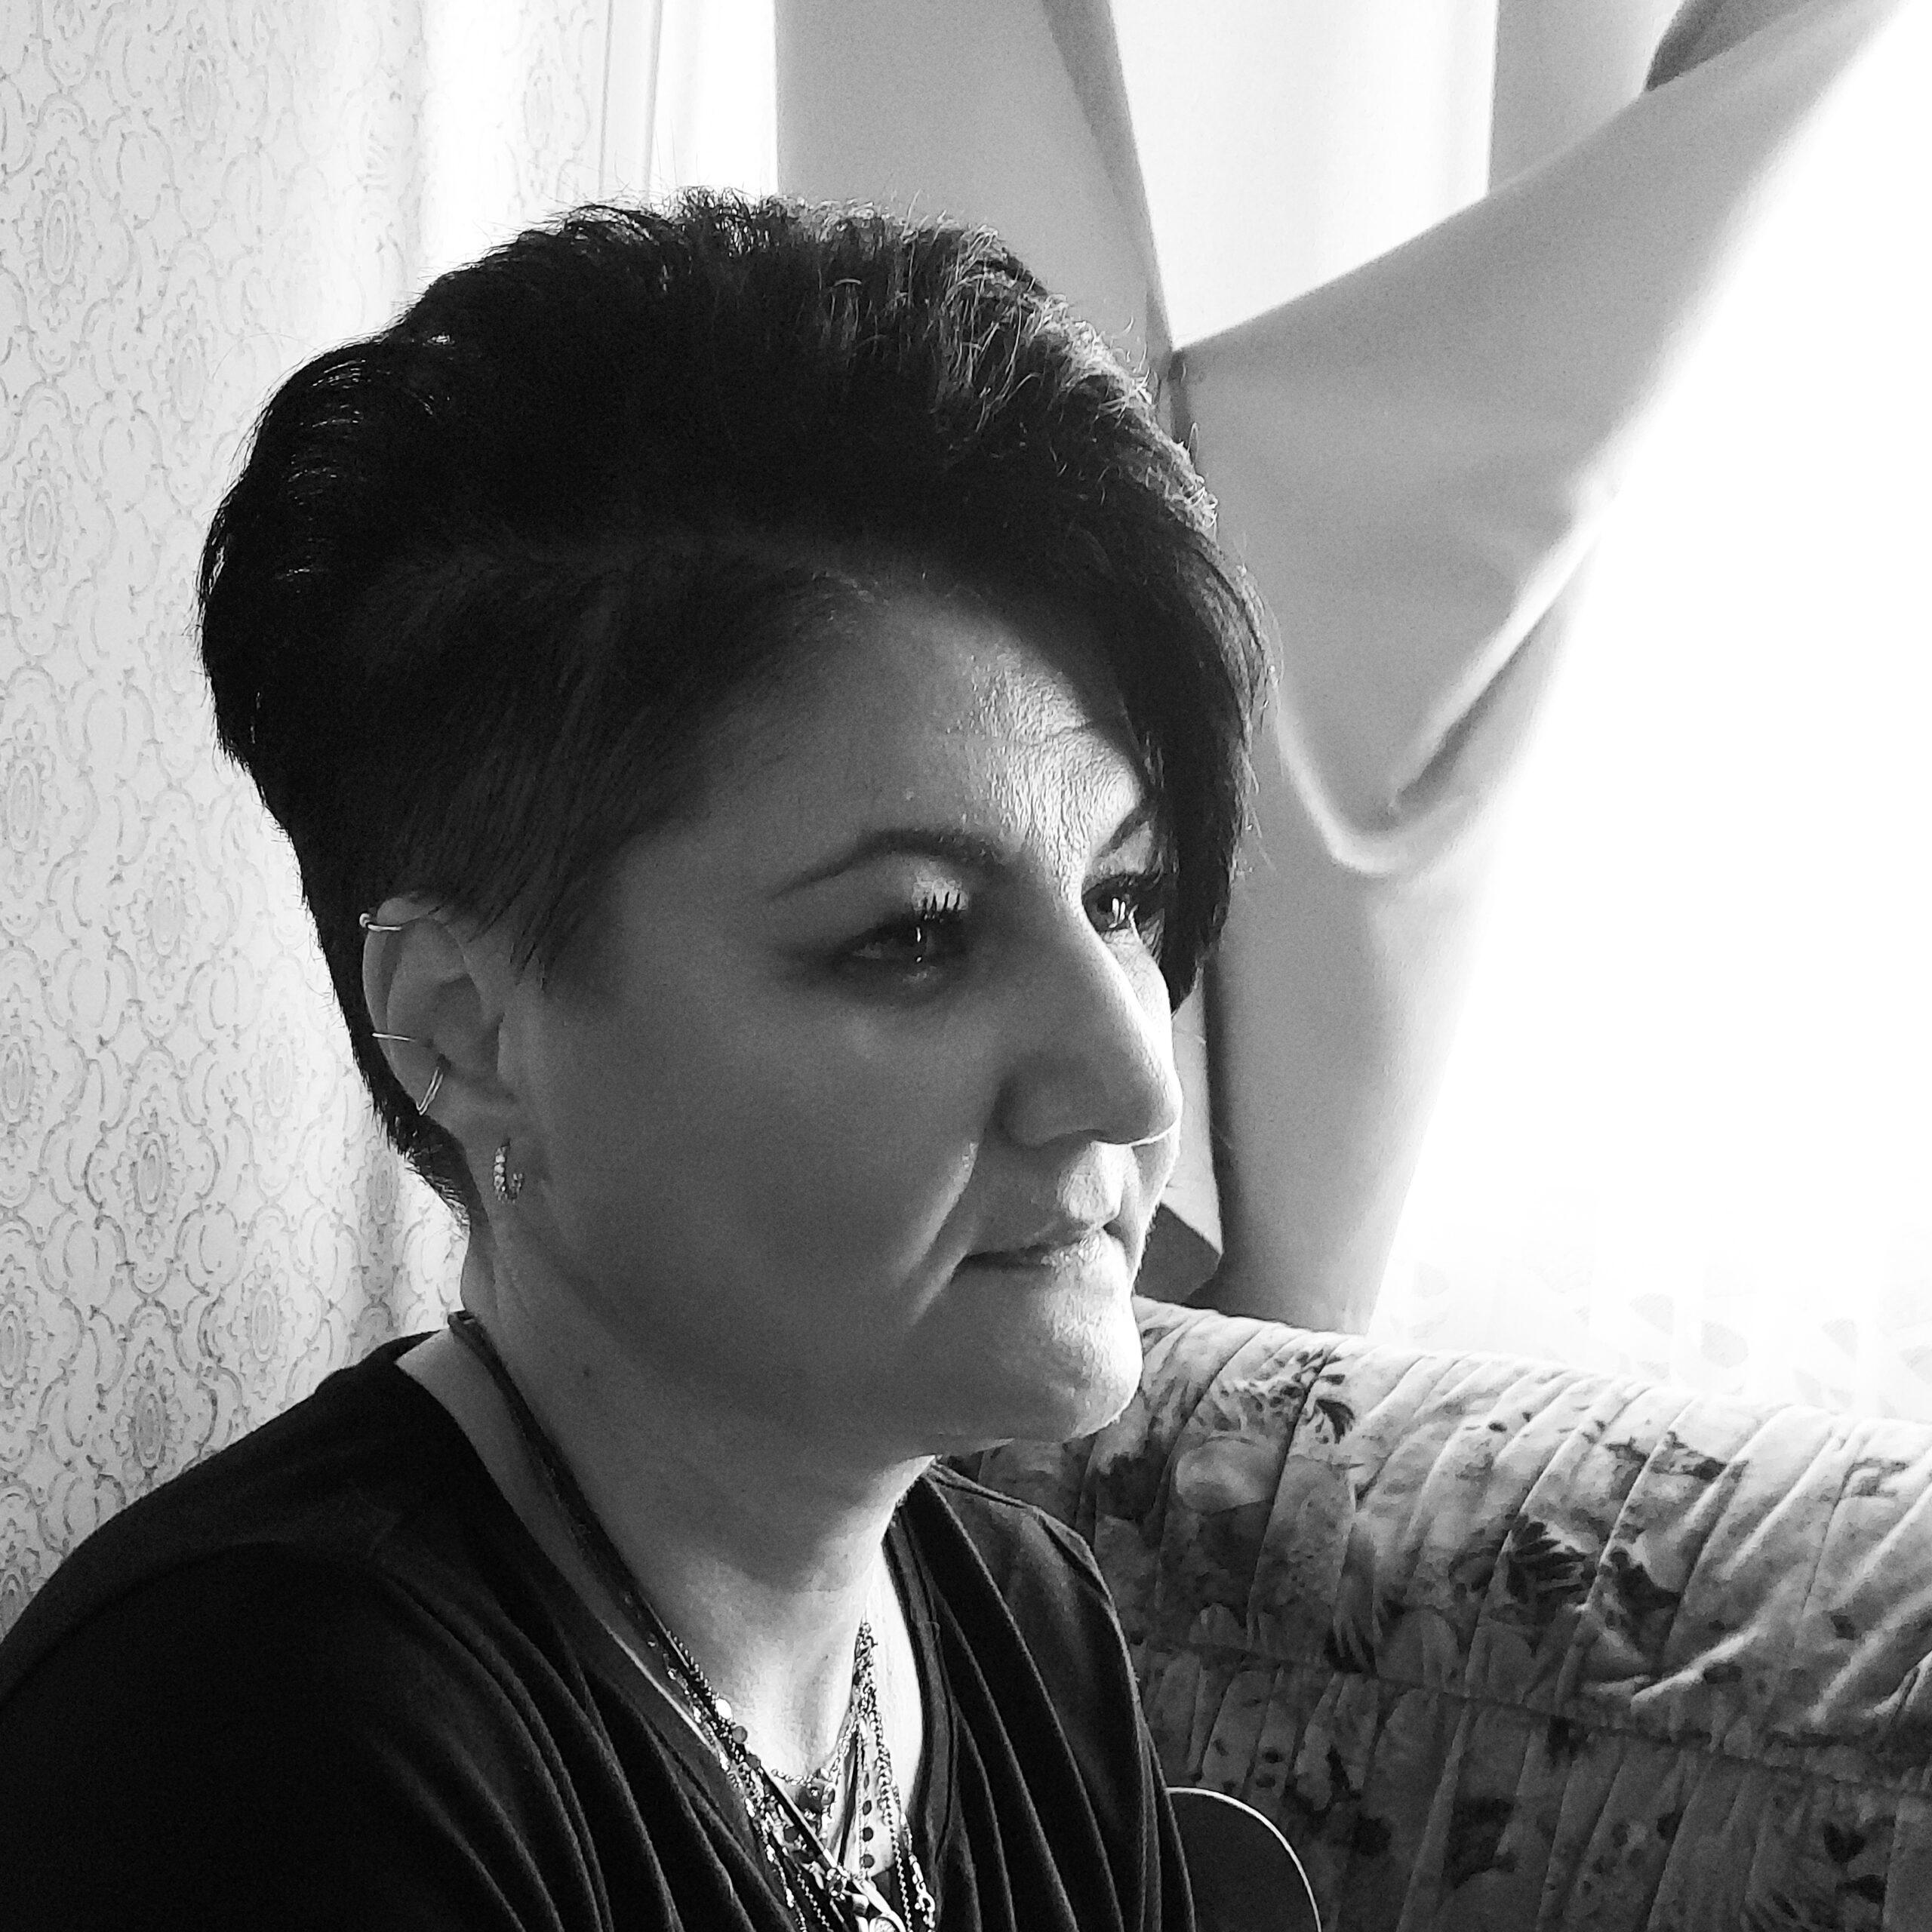 Ana Ignat